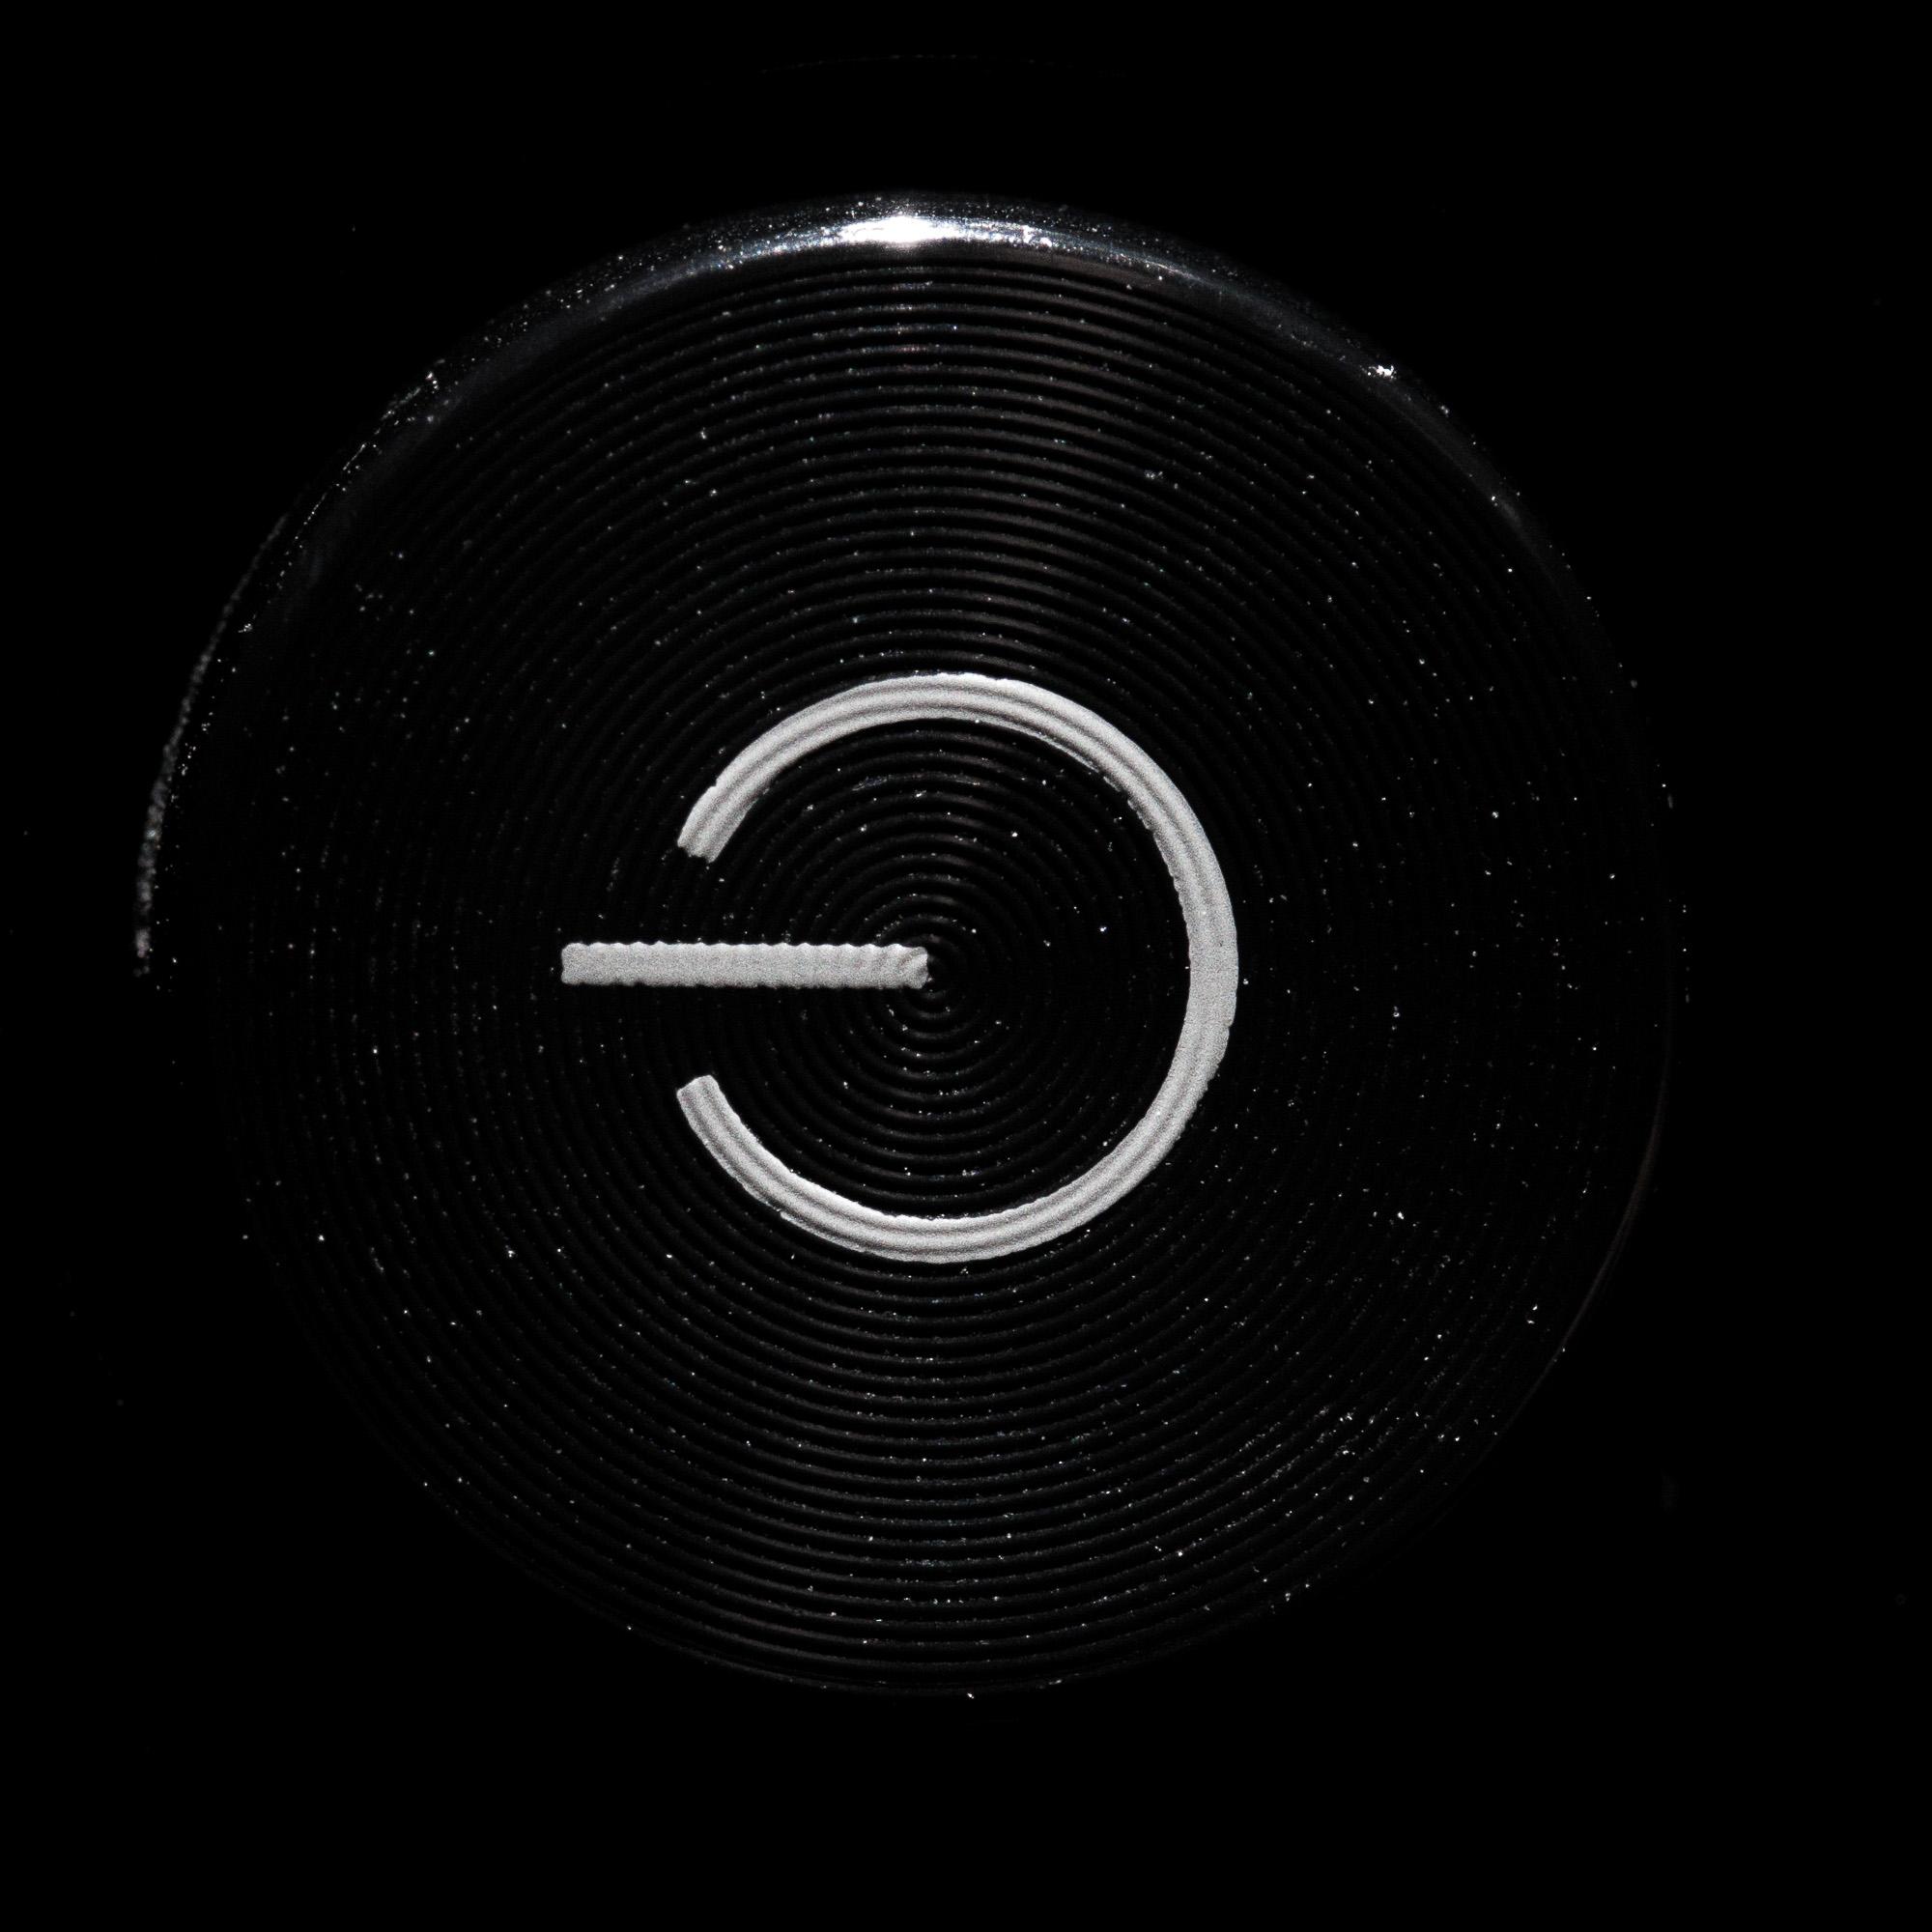 dabu / Reverse-Pac-Man